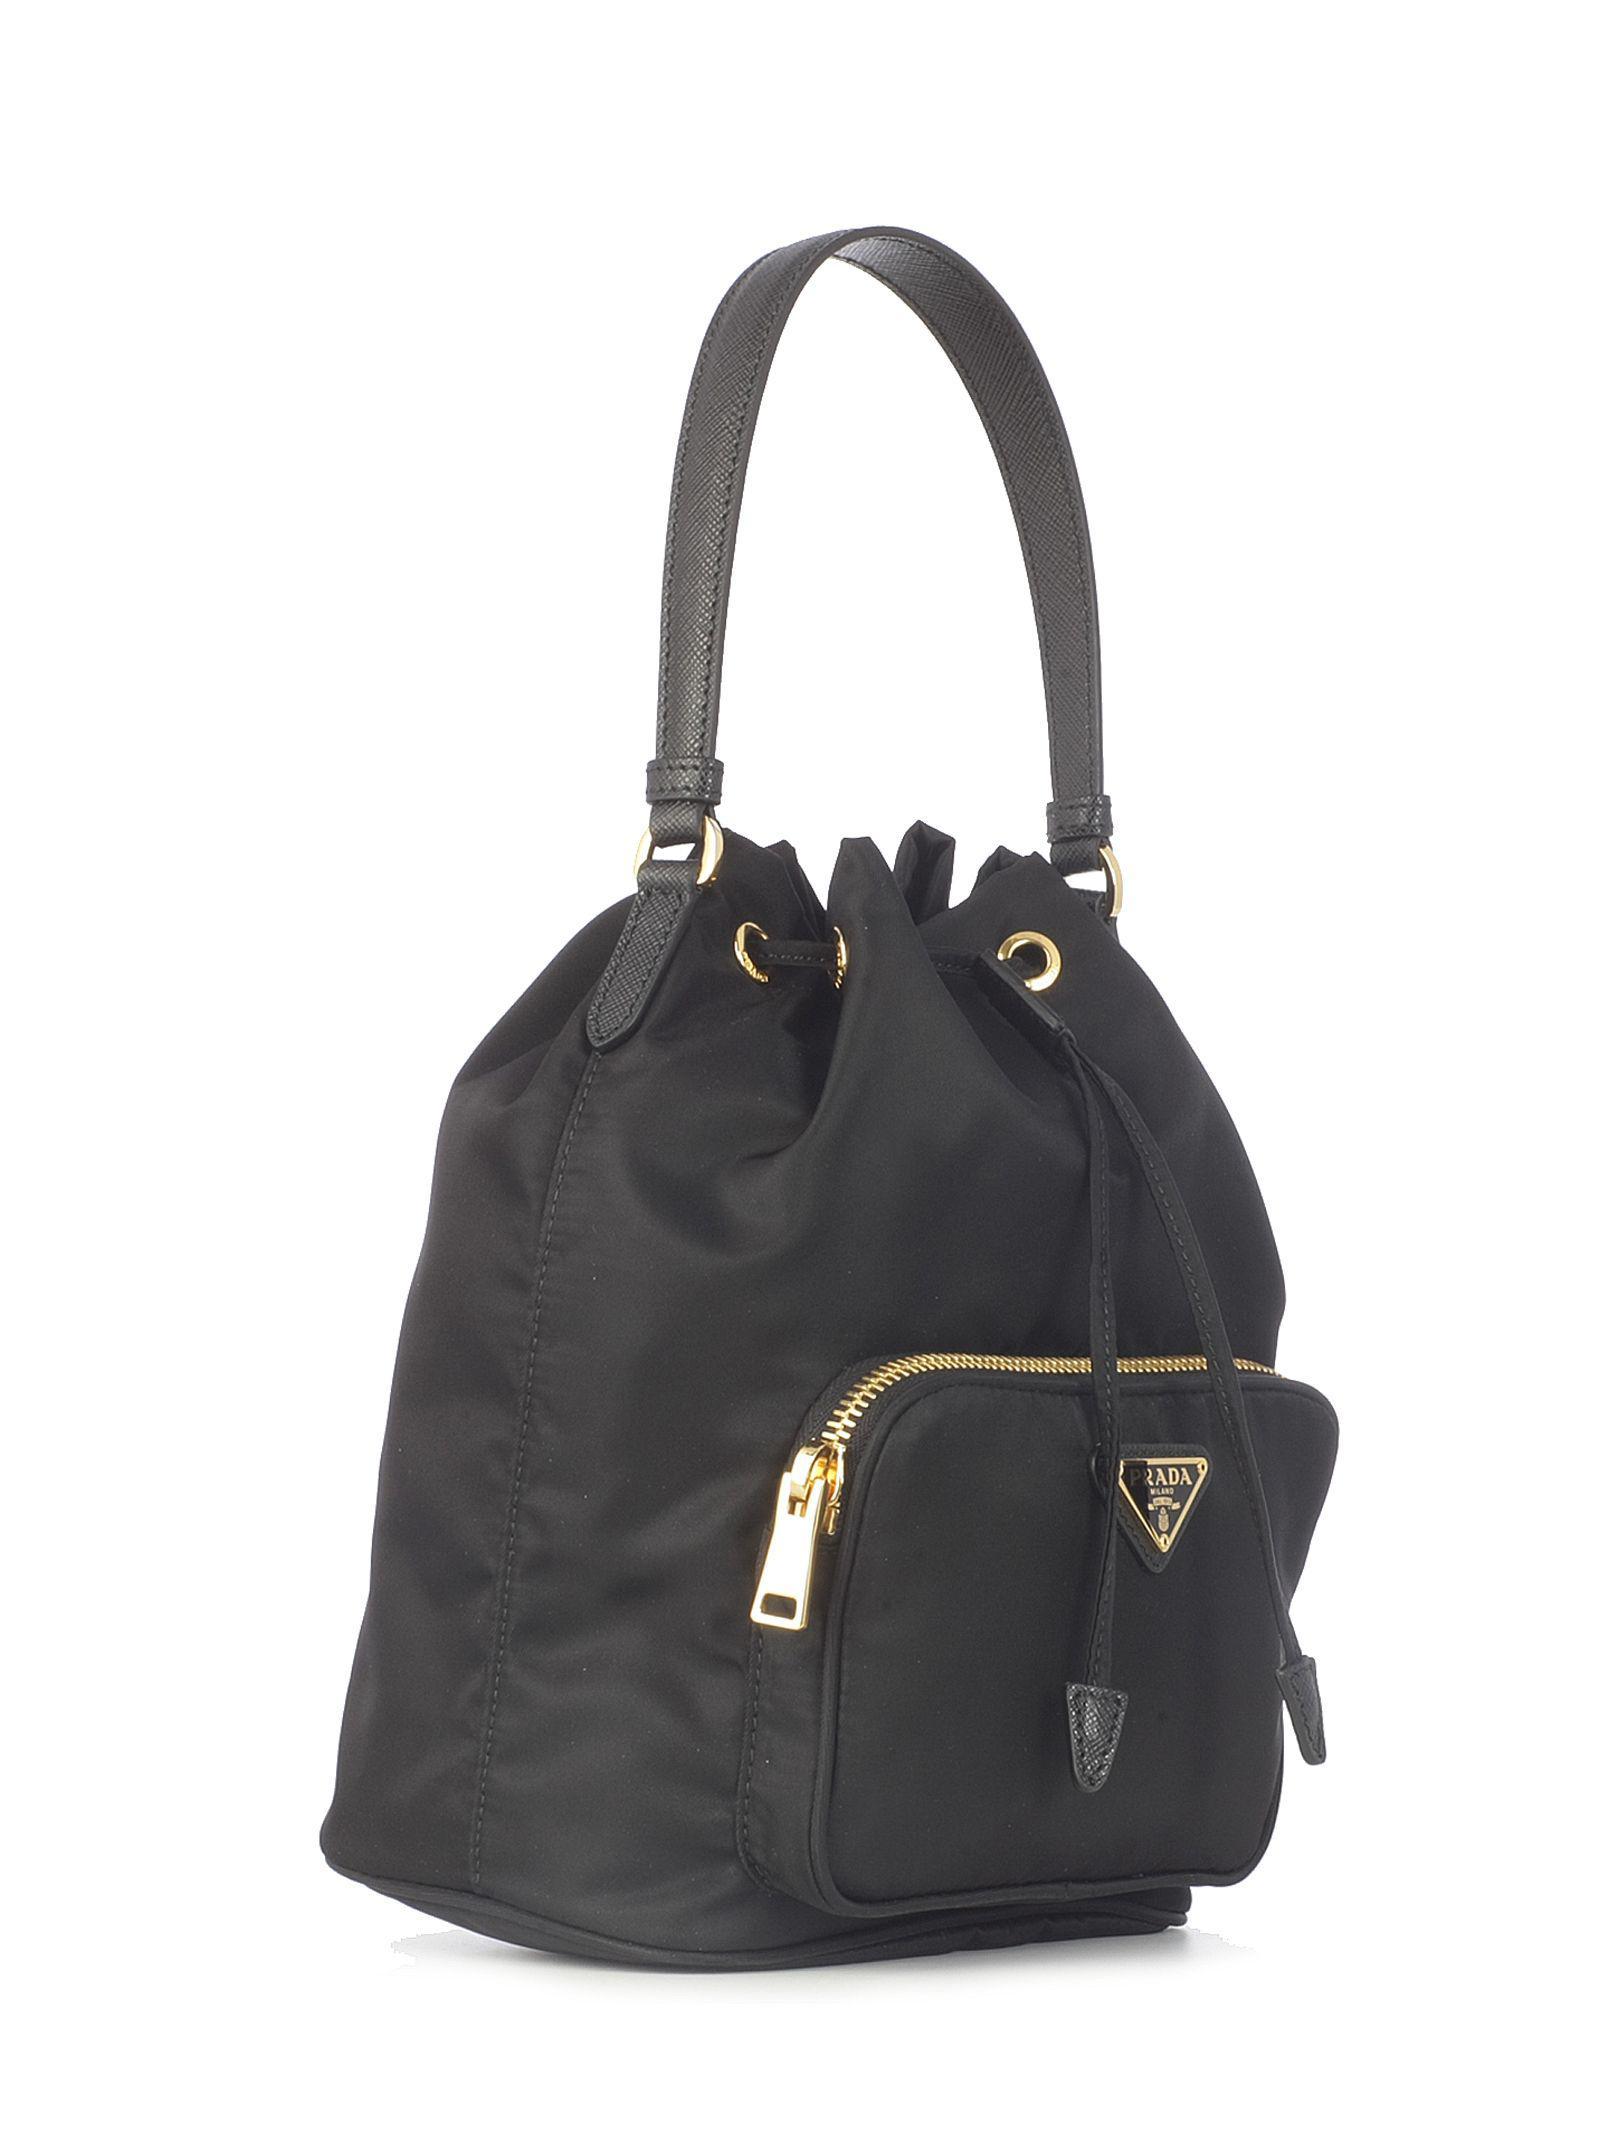 966ce321a0 Prada - Women s Black Polyamide Handbag - Lyst. View fullscreen